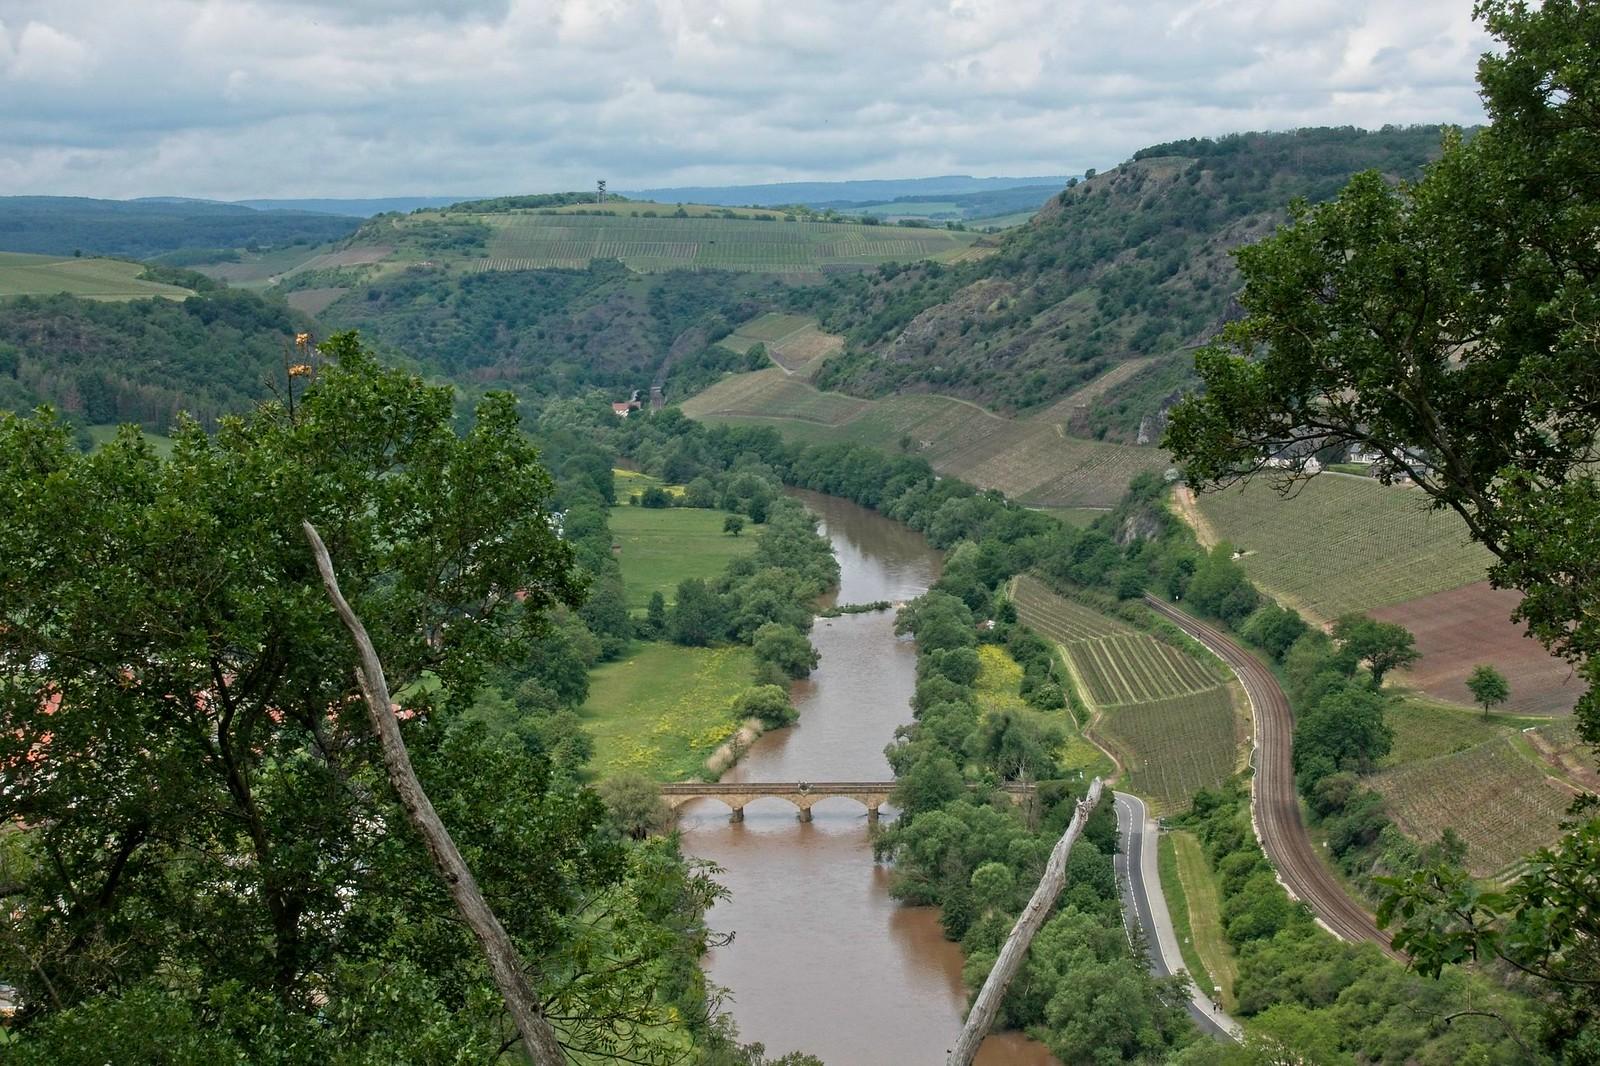 Luitpoldbrücke über die Nahe - Vitaltour Geheimnisvoller Lemberg